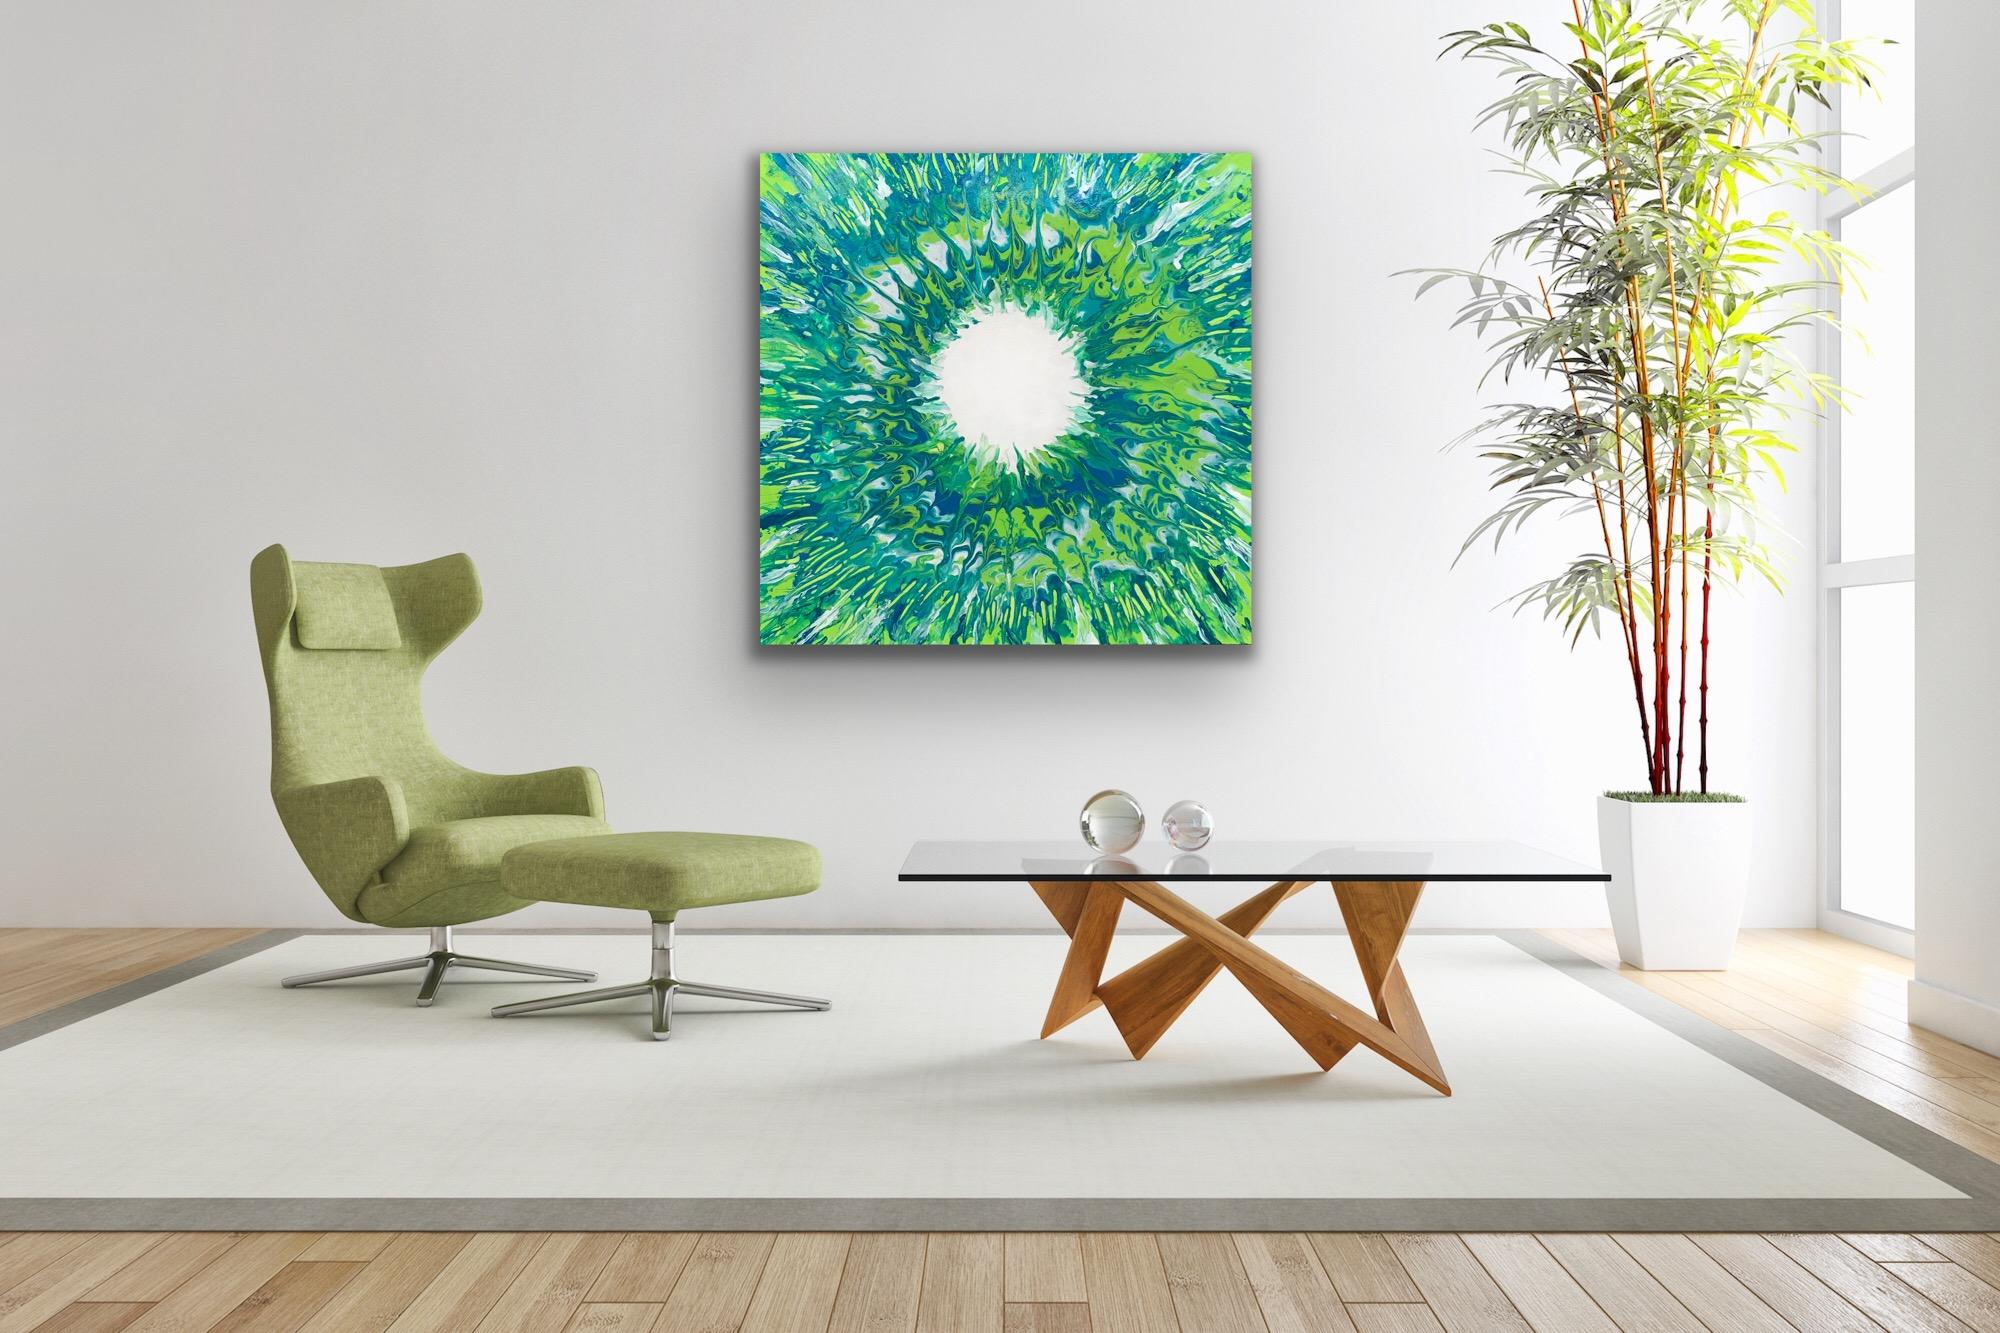 Aqua Twirl by Amanda Stavast | ArtworkNetwork.com